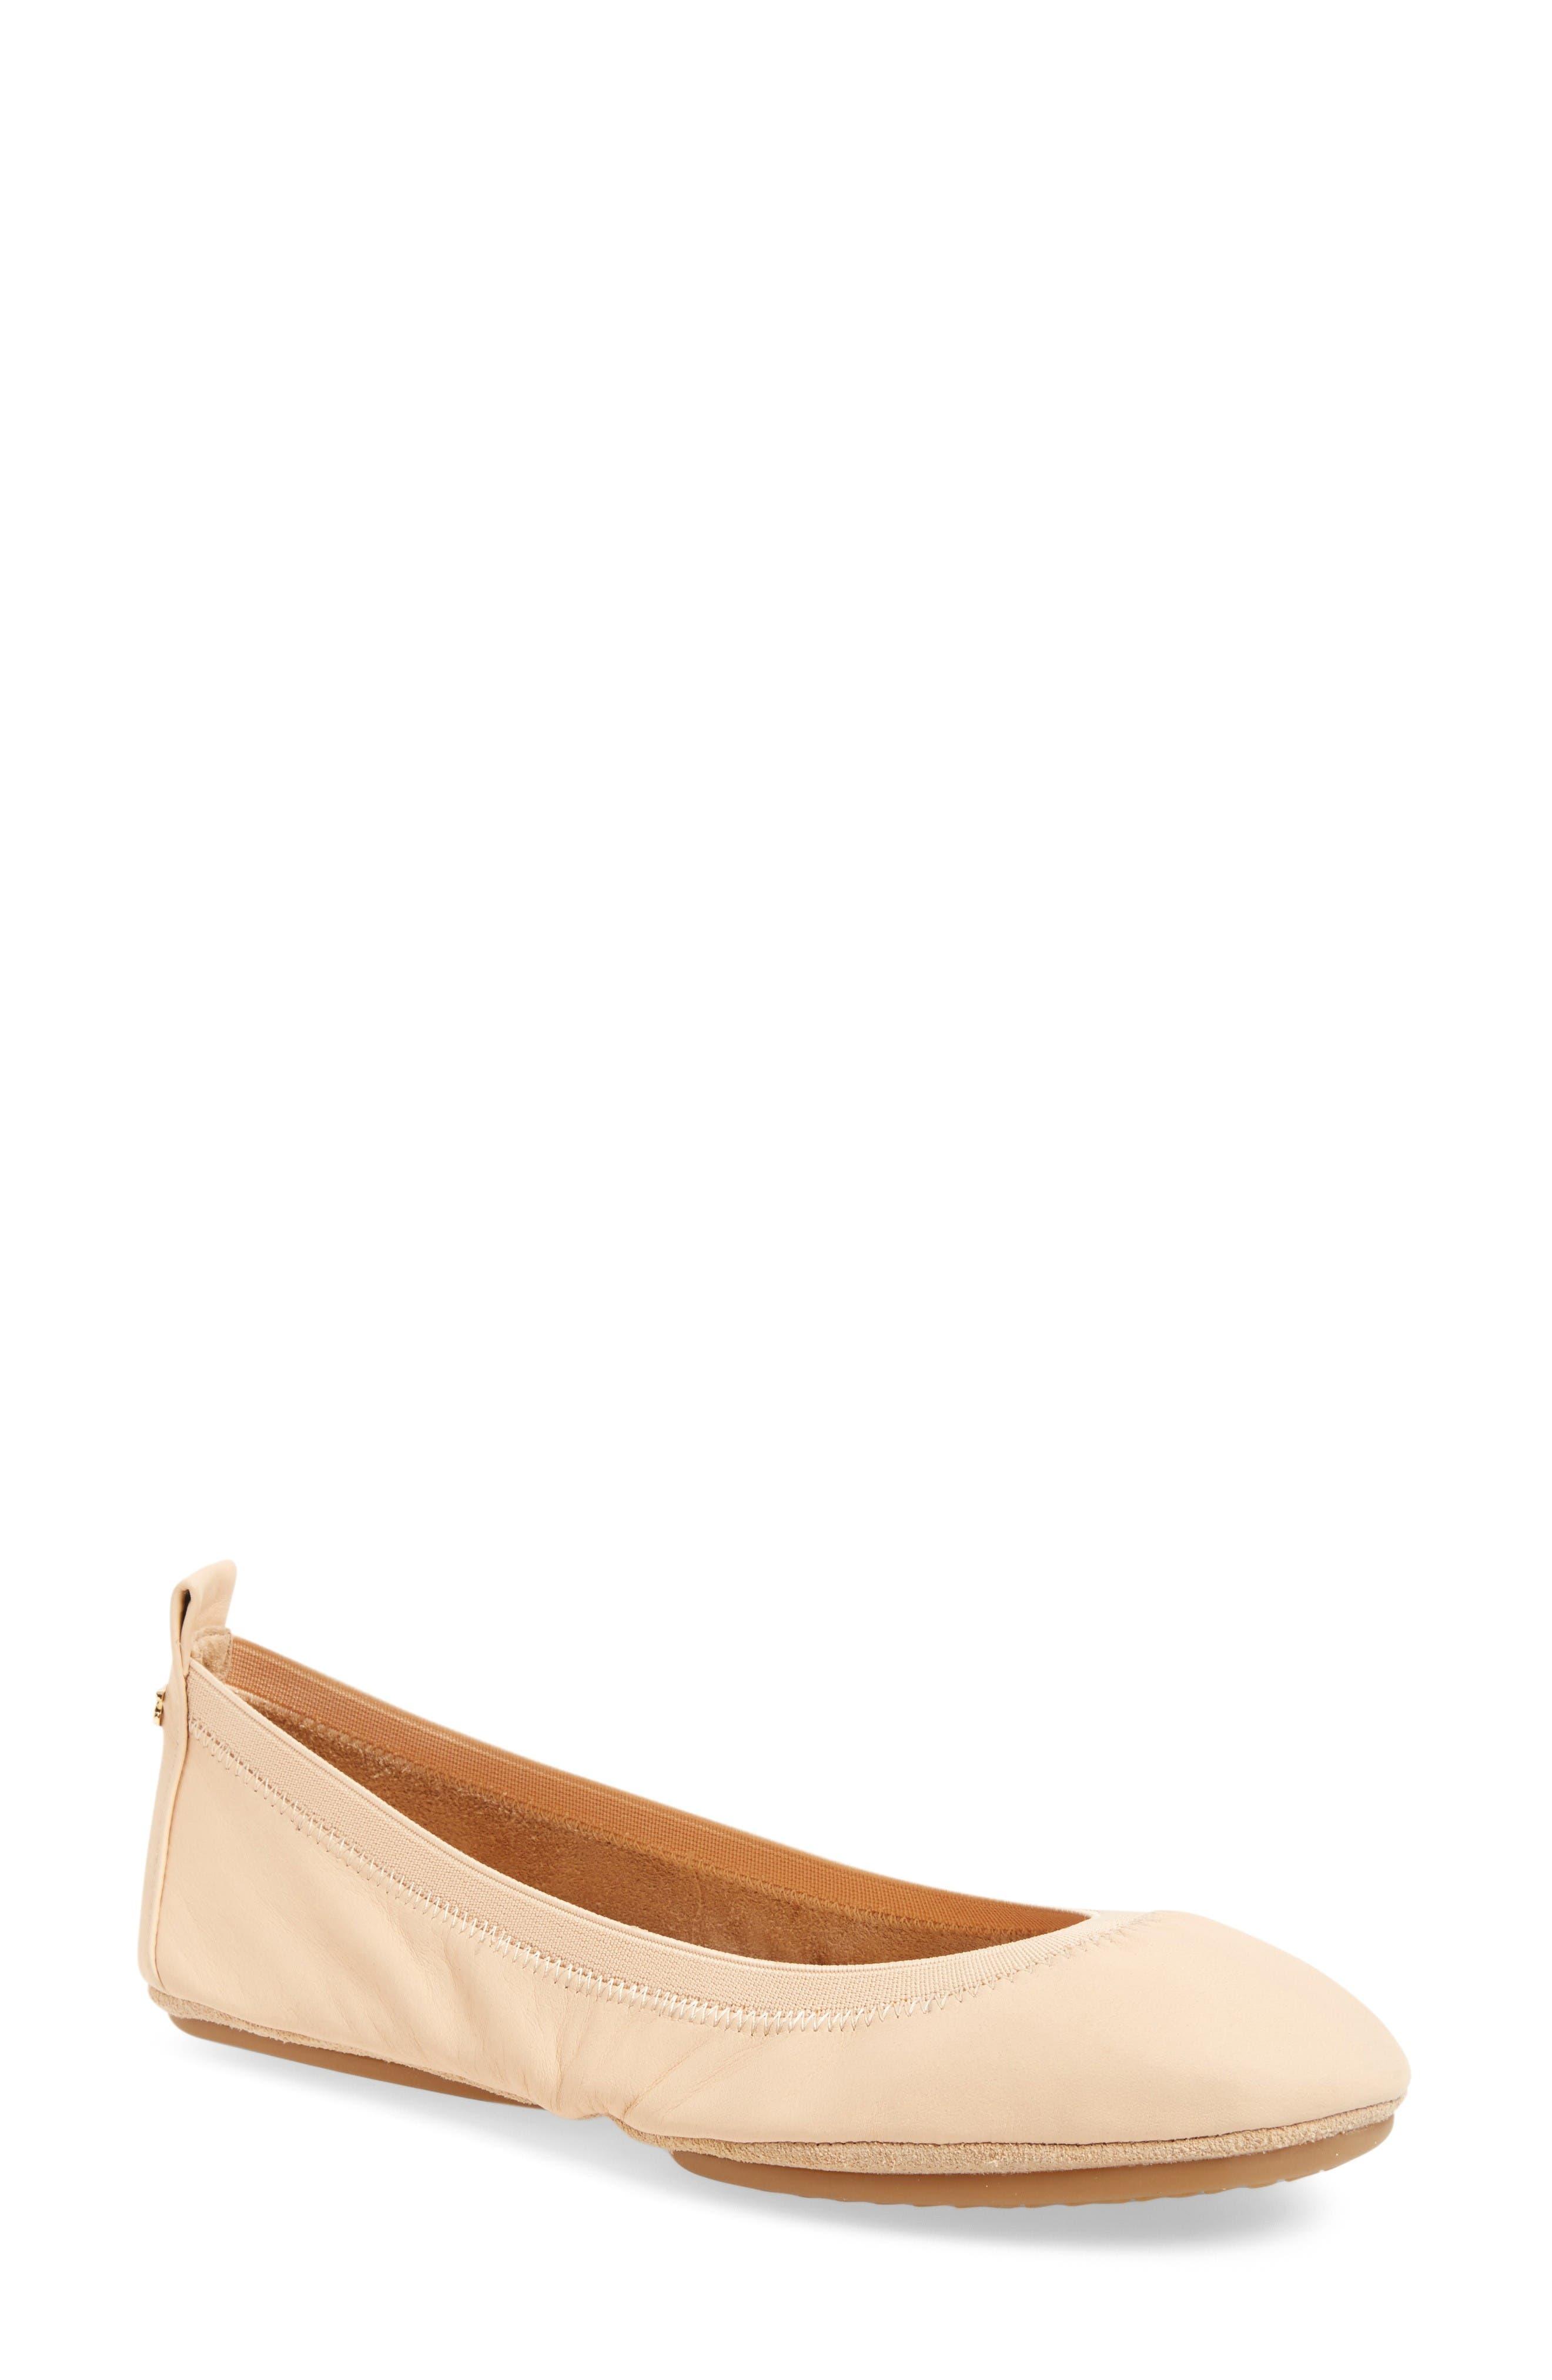 Samara Foldable Ballet Flat,                         Main,                         color, Nude Leather